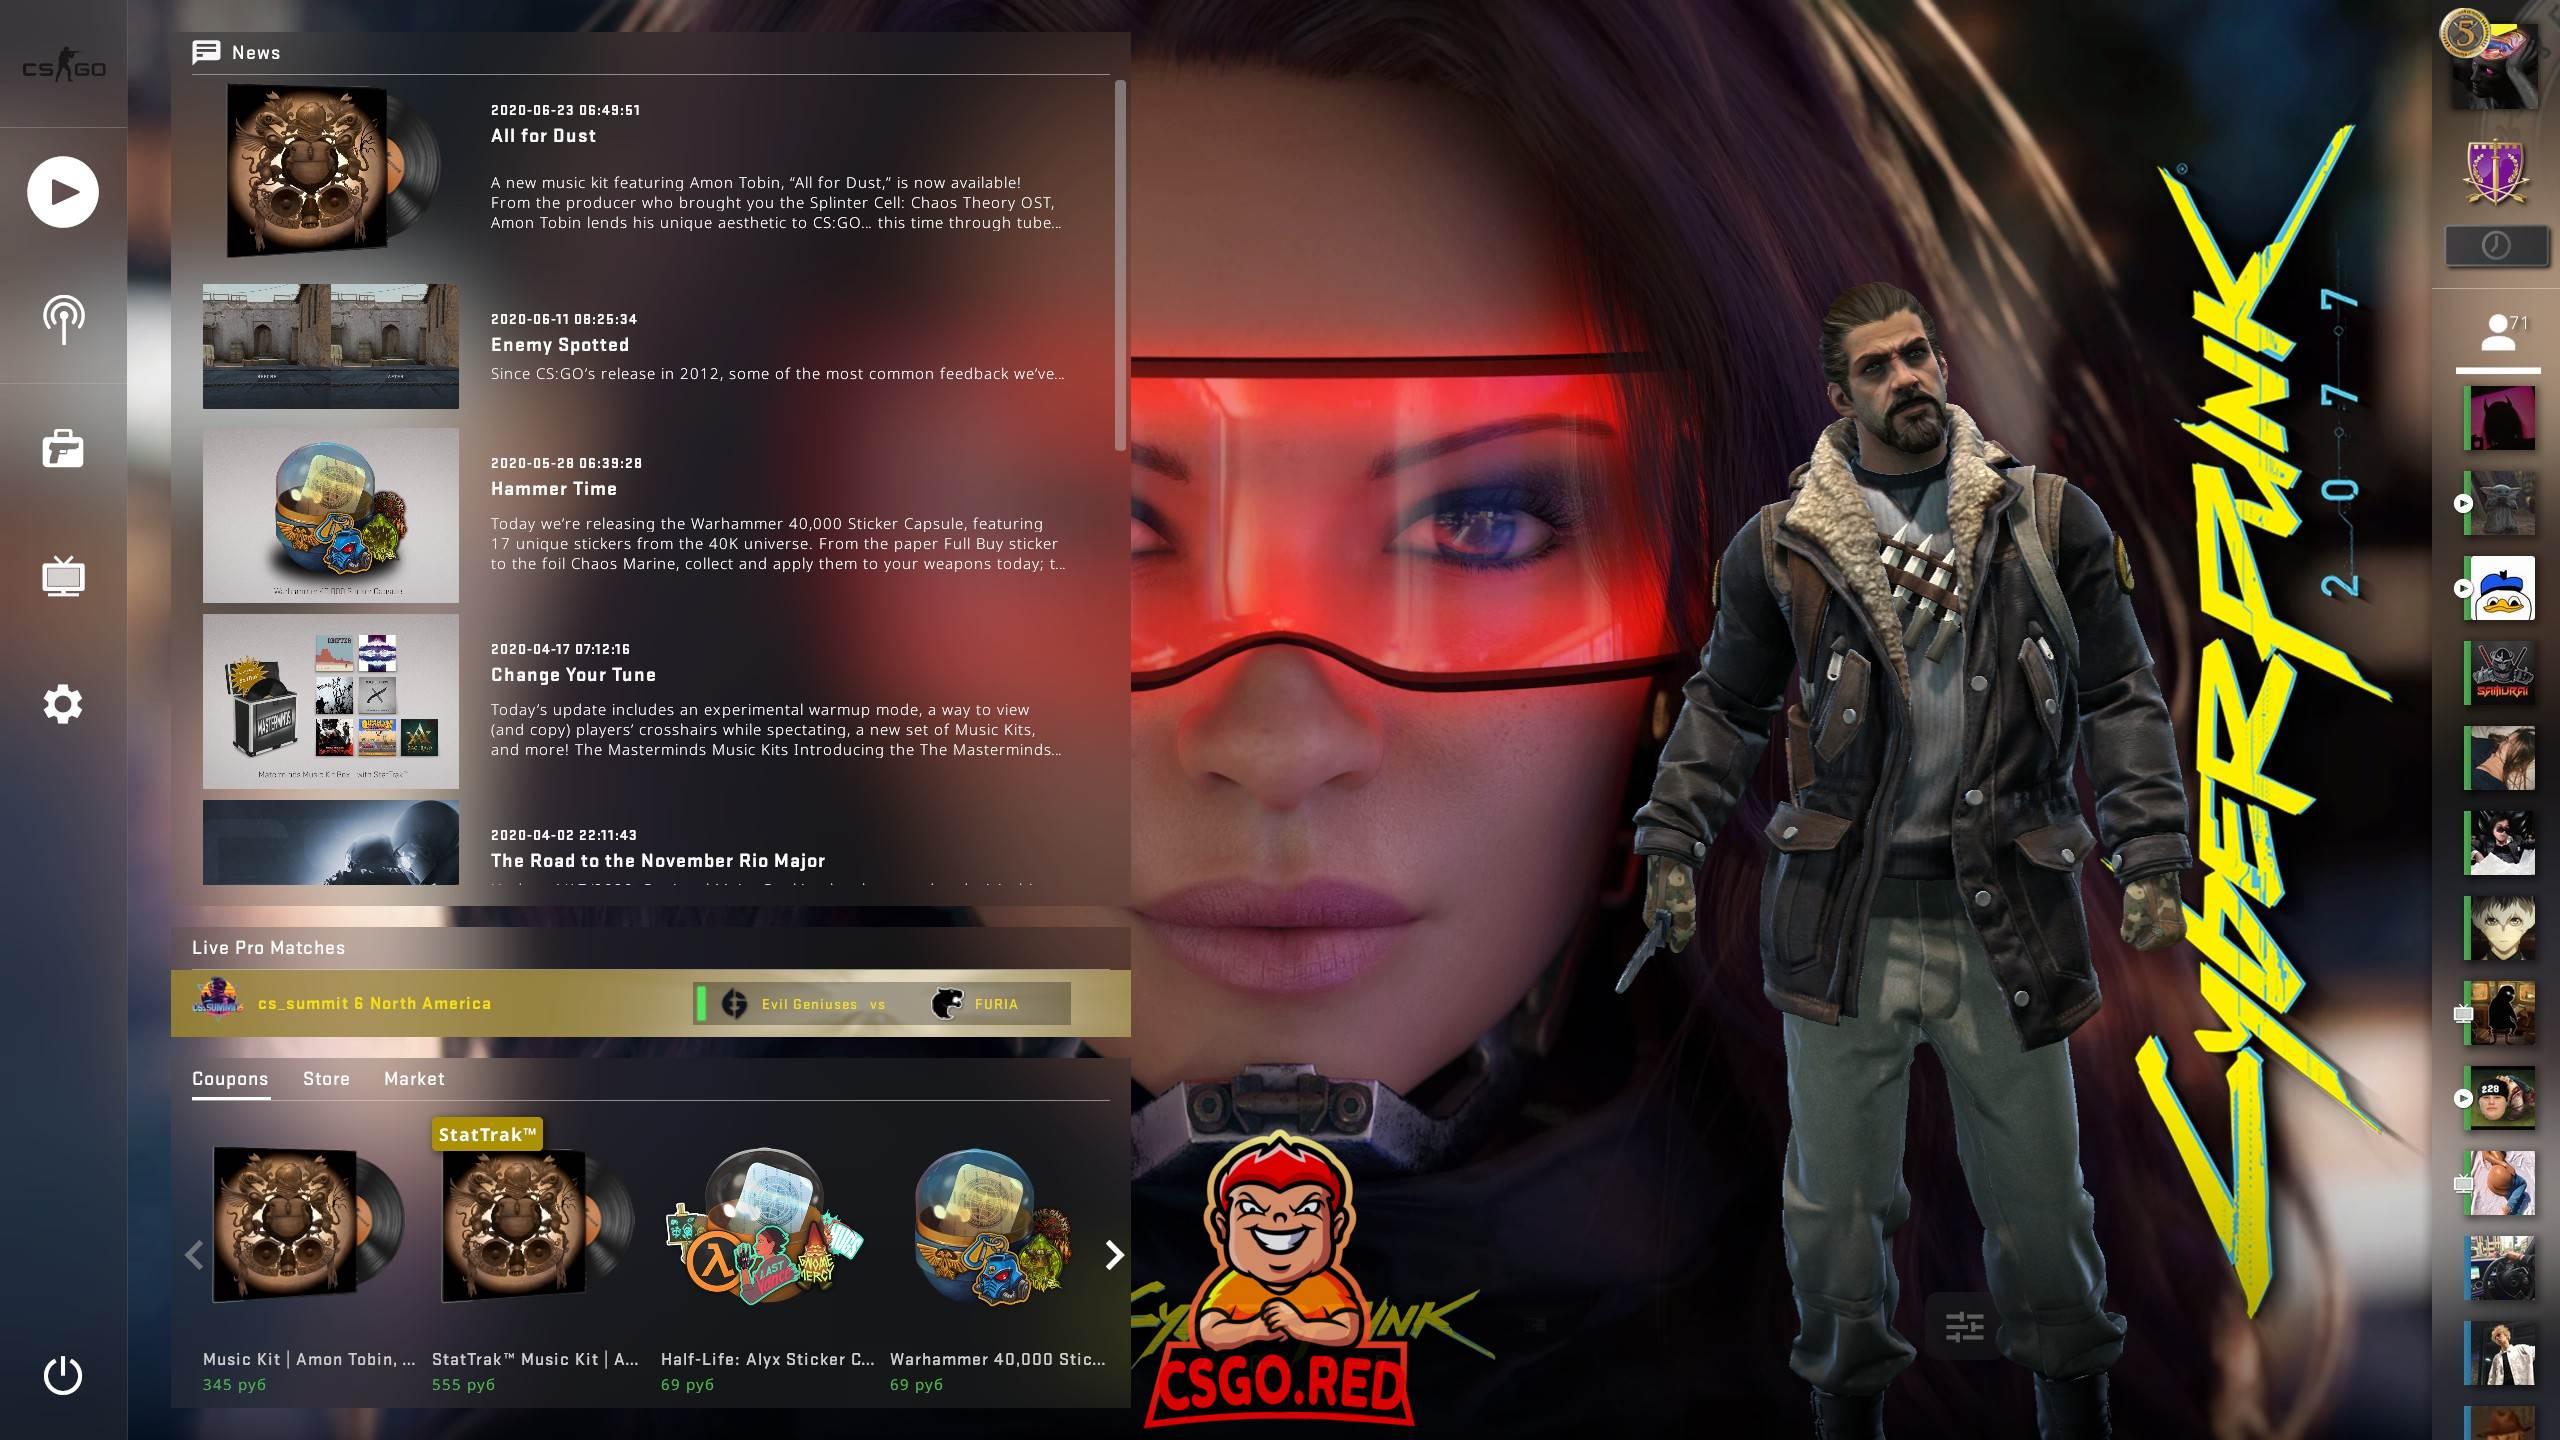 Cyberpunk 2077 woman background